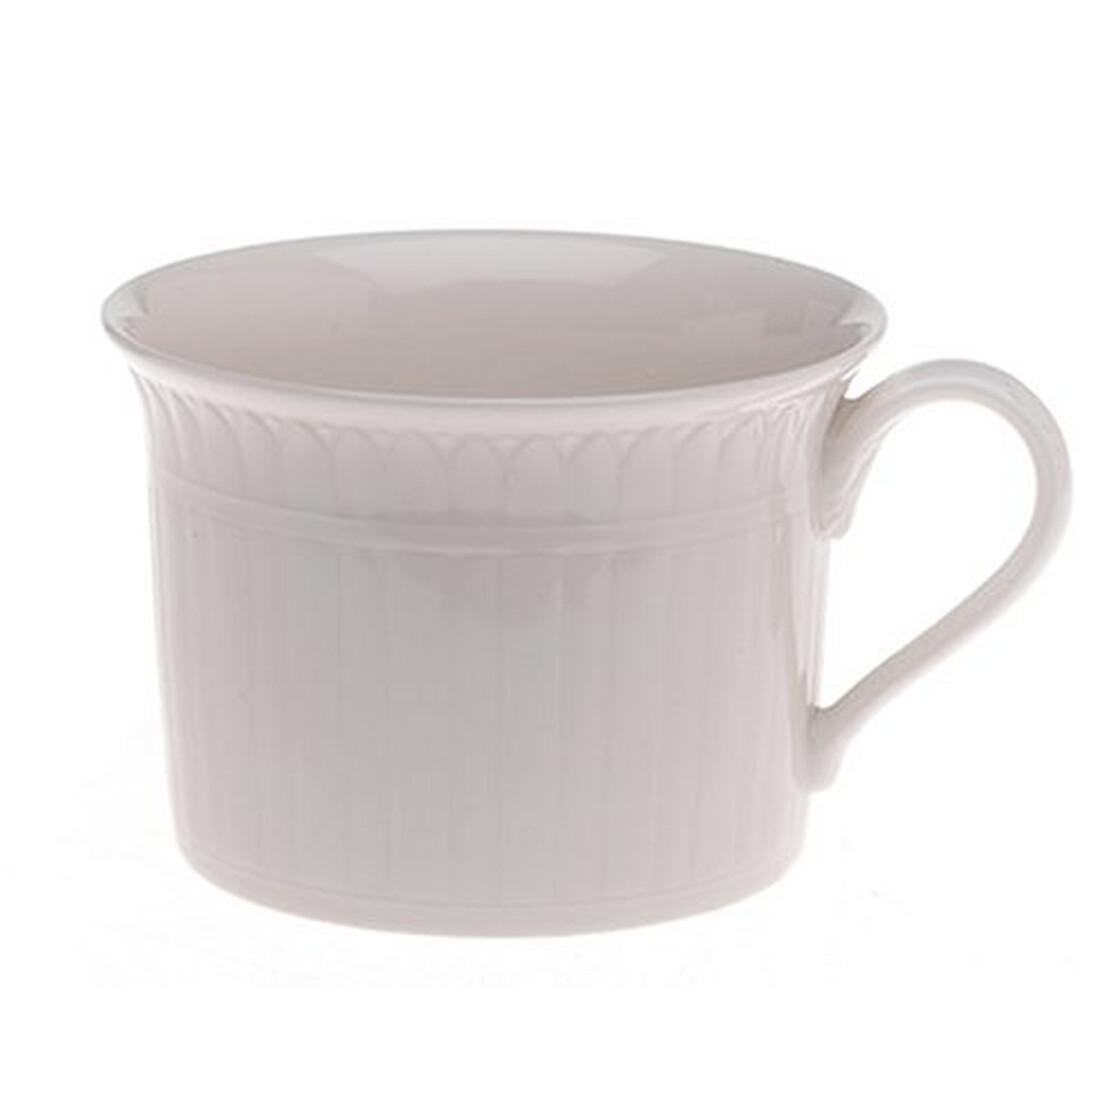 Boch Petite Fleur Kaffeetasse 2 tlg 0,20 l. Villeroy